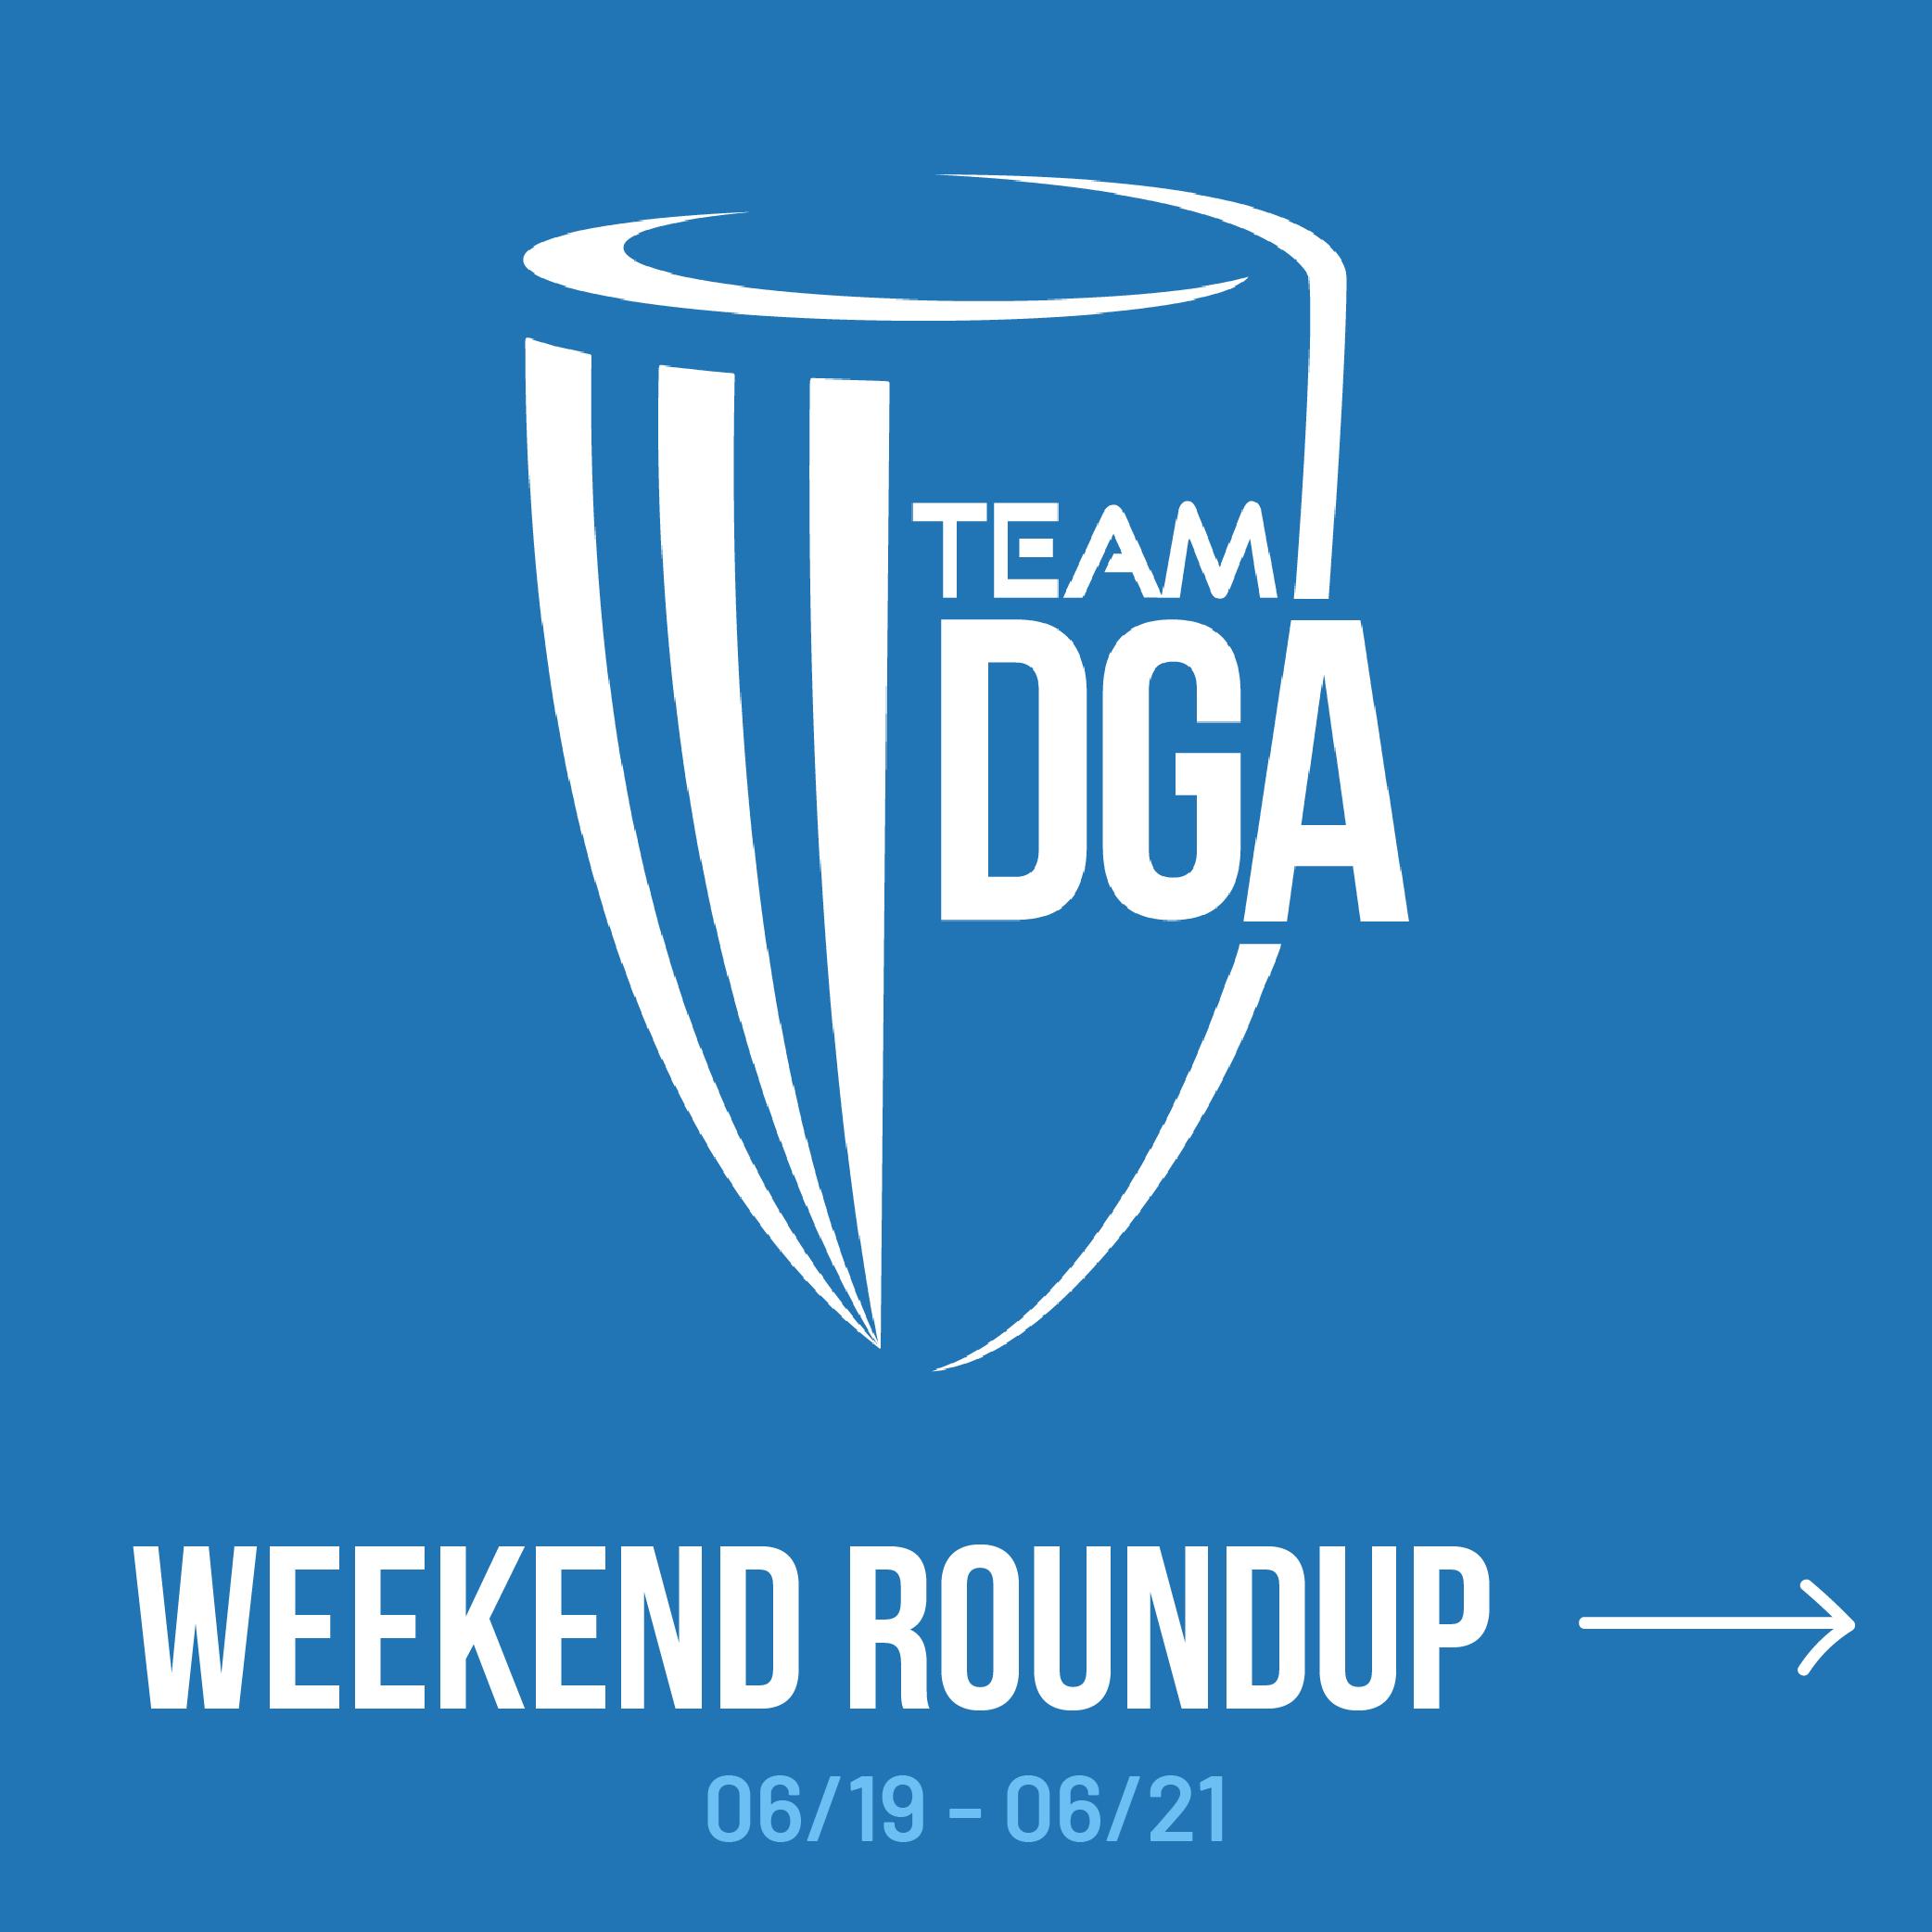 Team dga weekend roundup 6/19 - 6/21